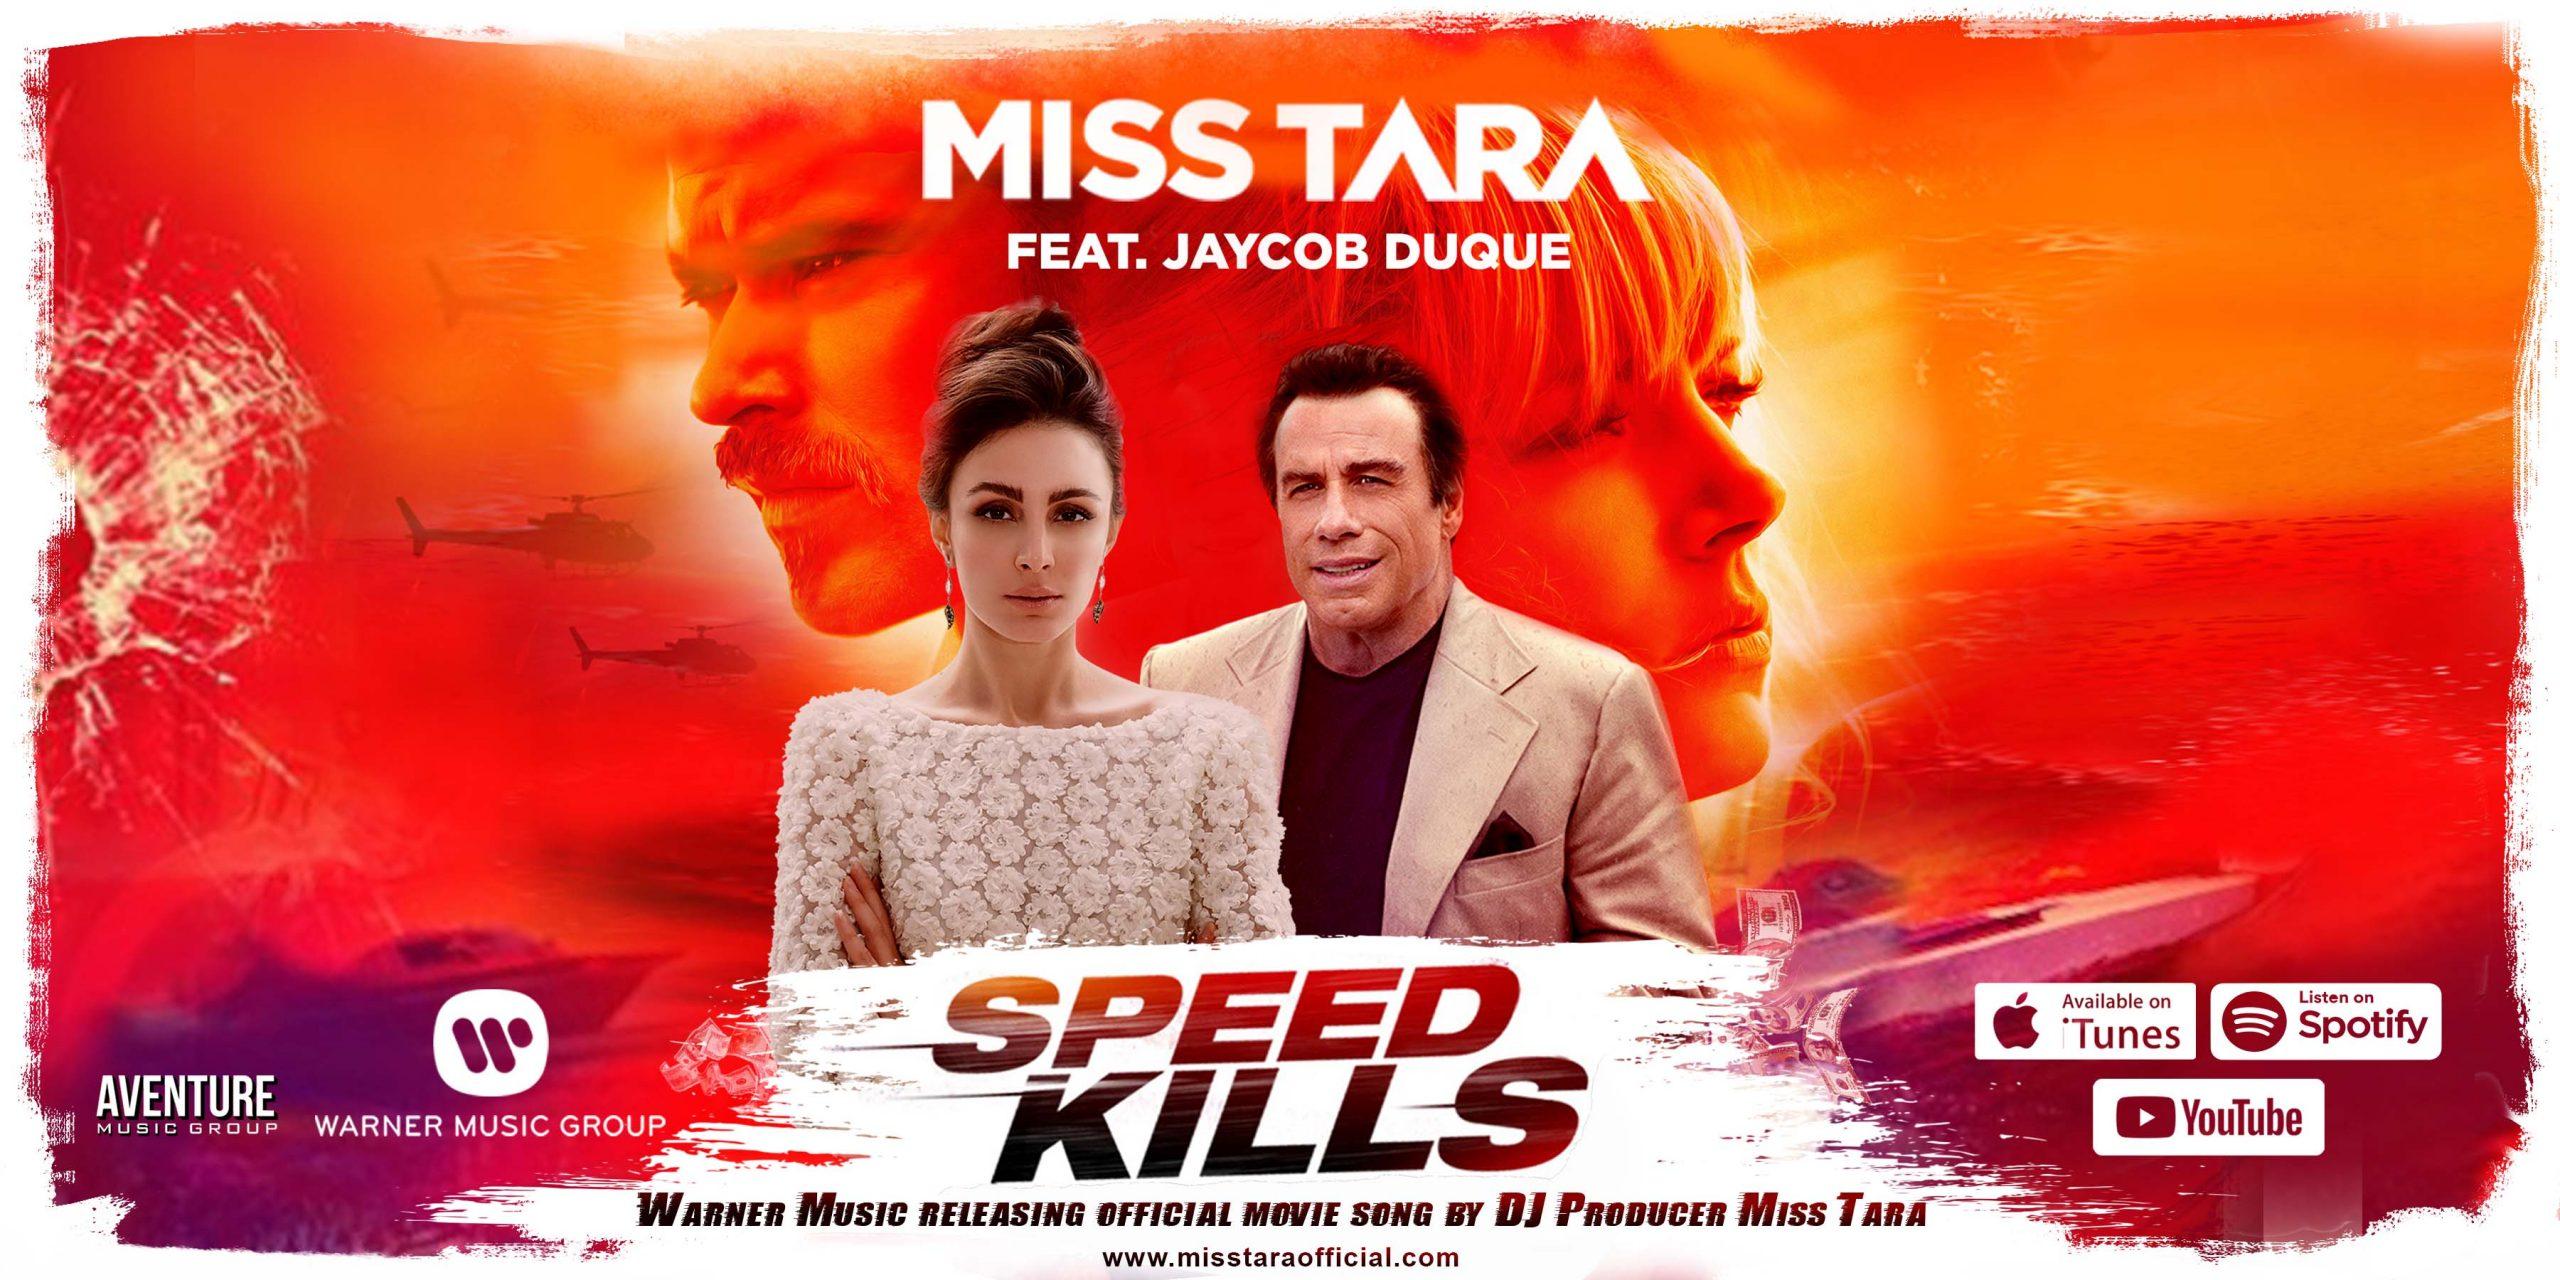 Speed Kills starring John Travolta